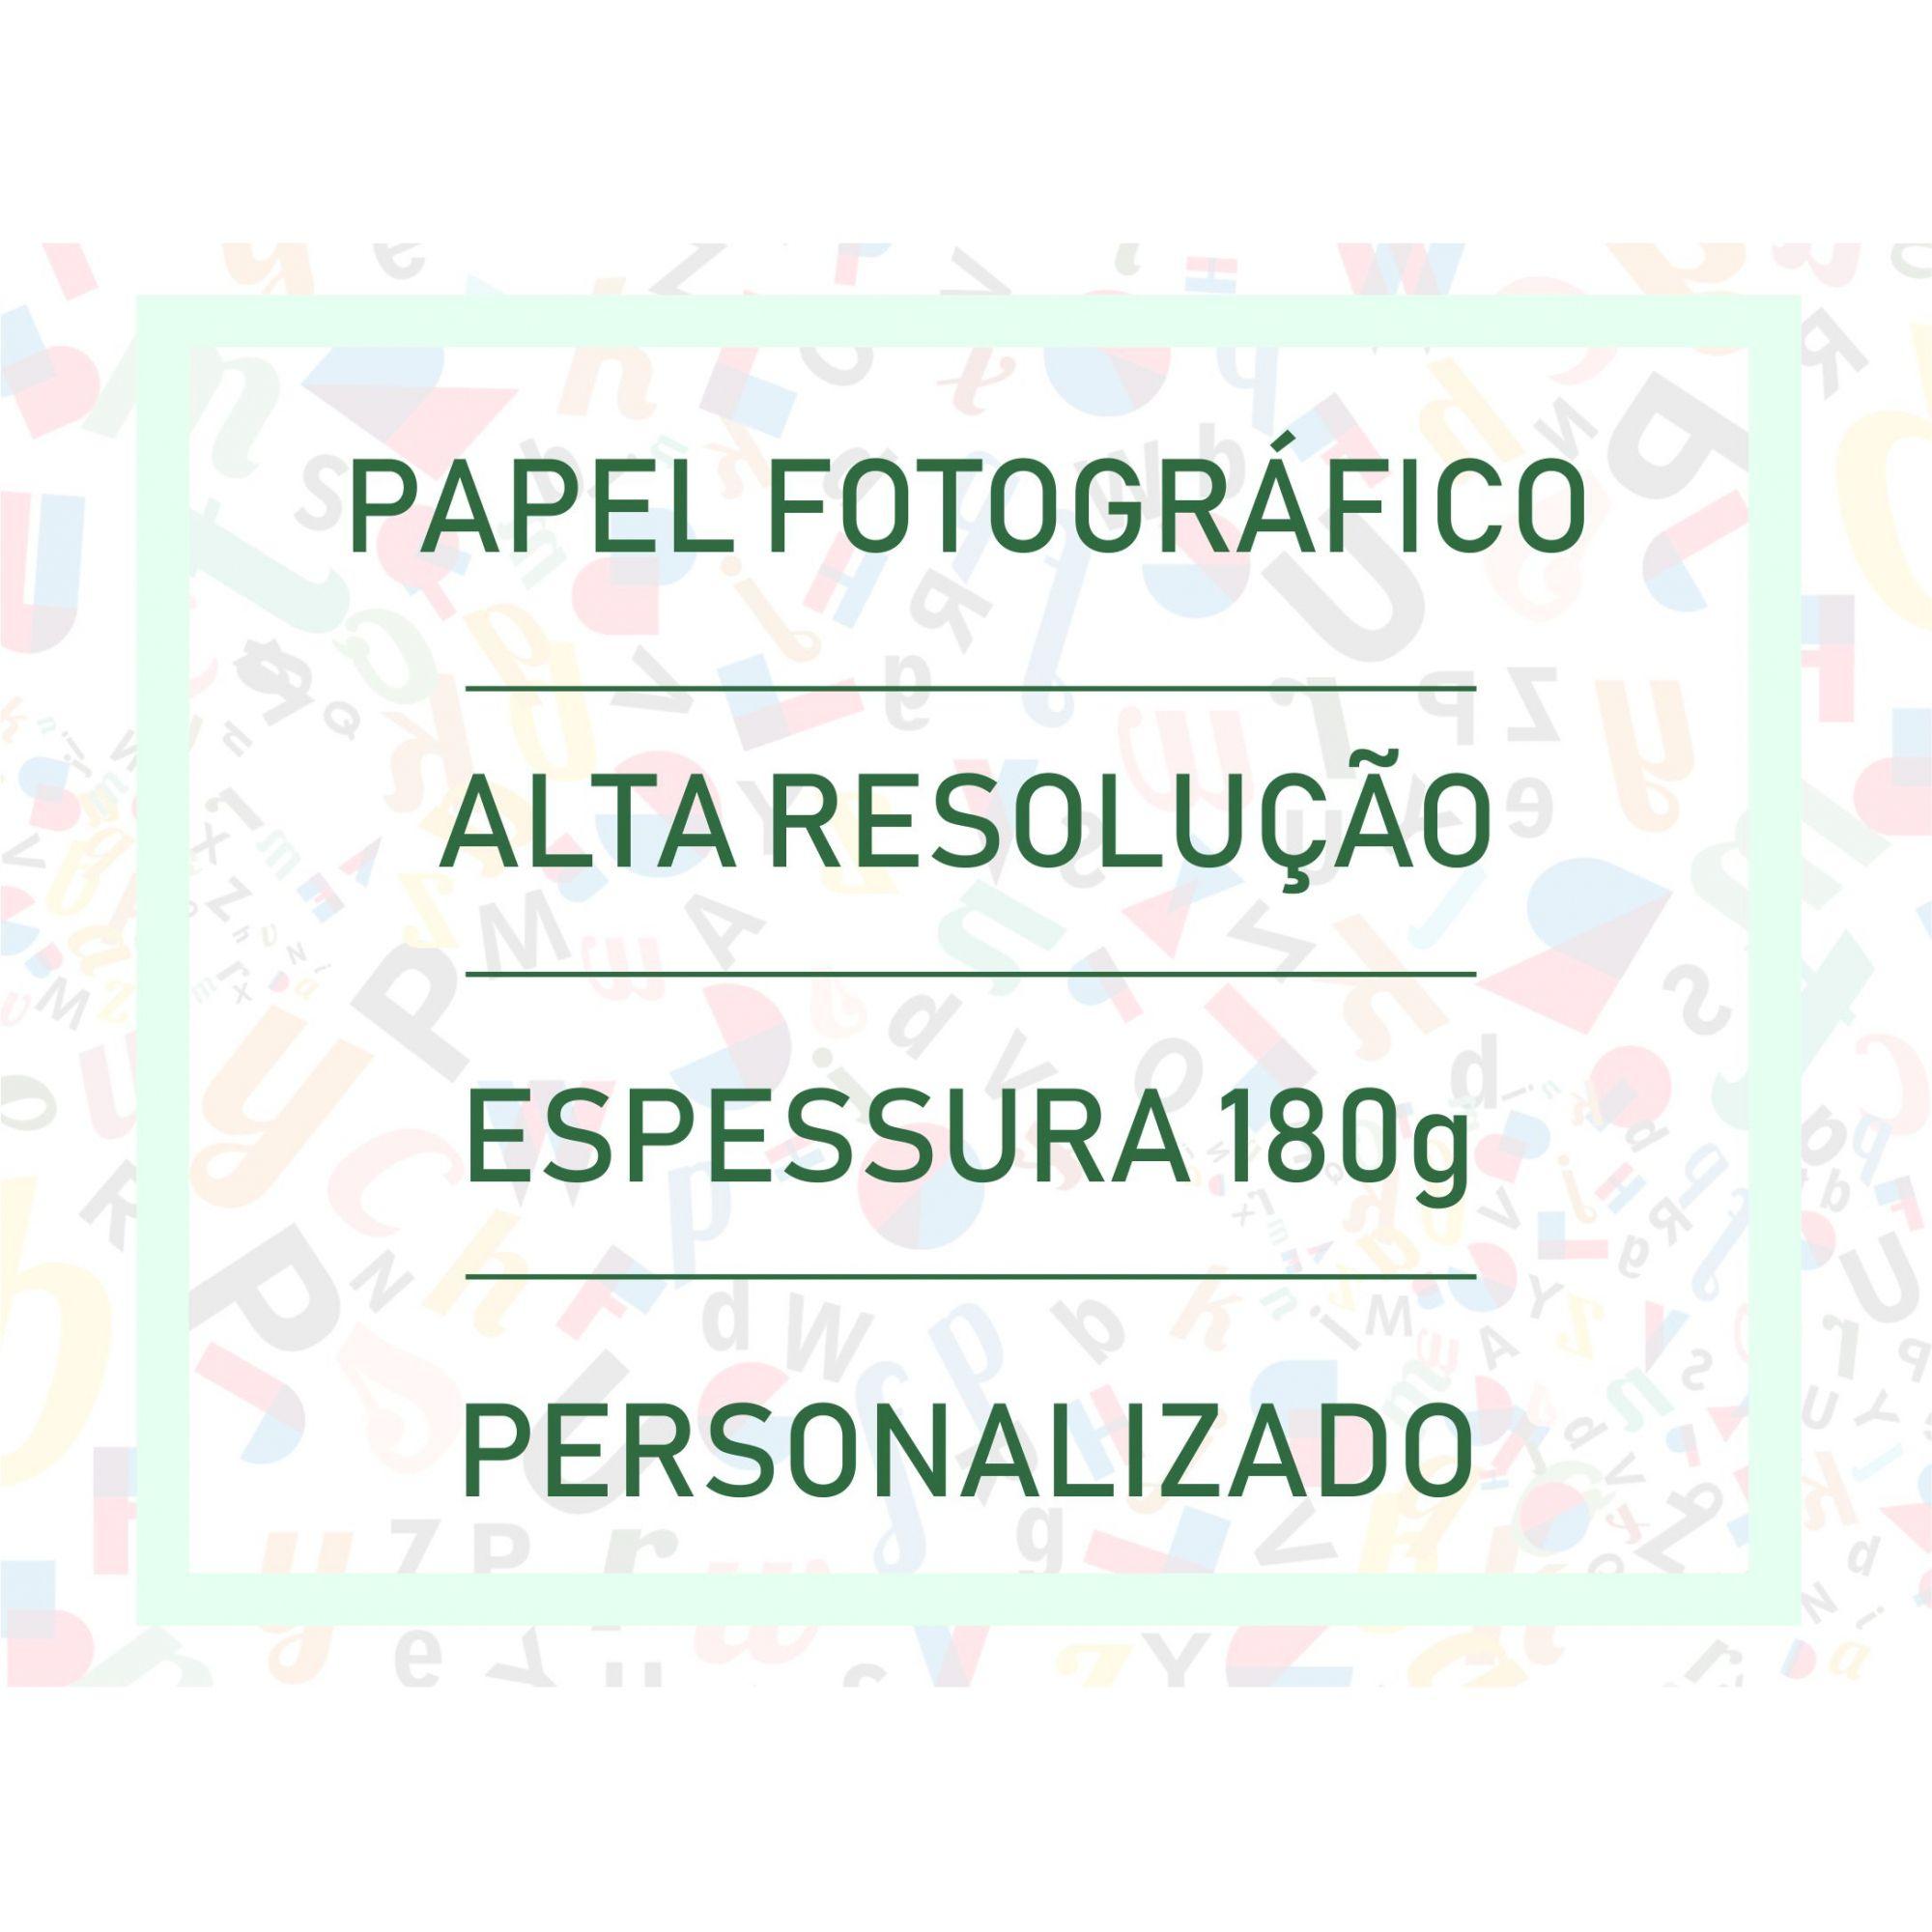 KIT 20 - 06 PRANCHAS JOGOS DE TRILHA FONEMAS PLOSIVOS - TEMÁTICA DE ANIMAIS